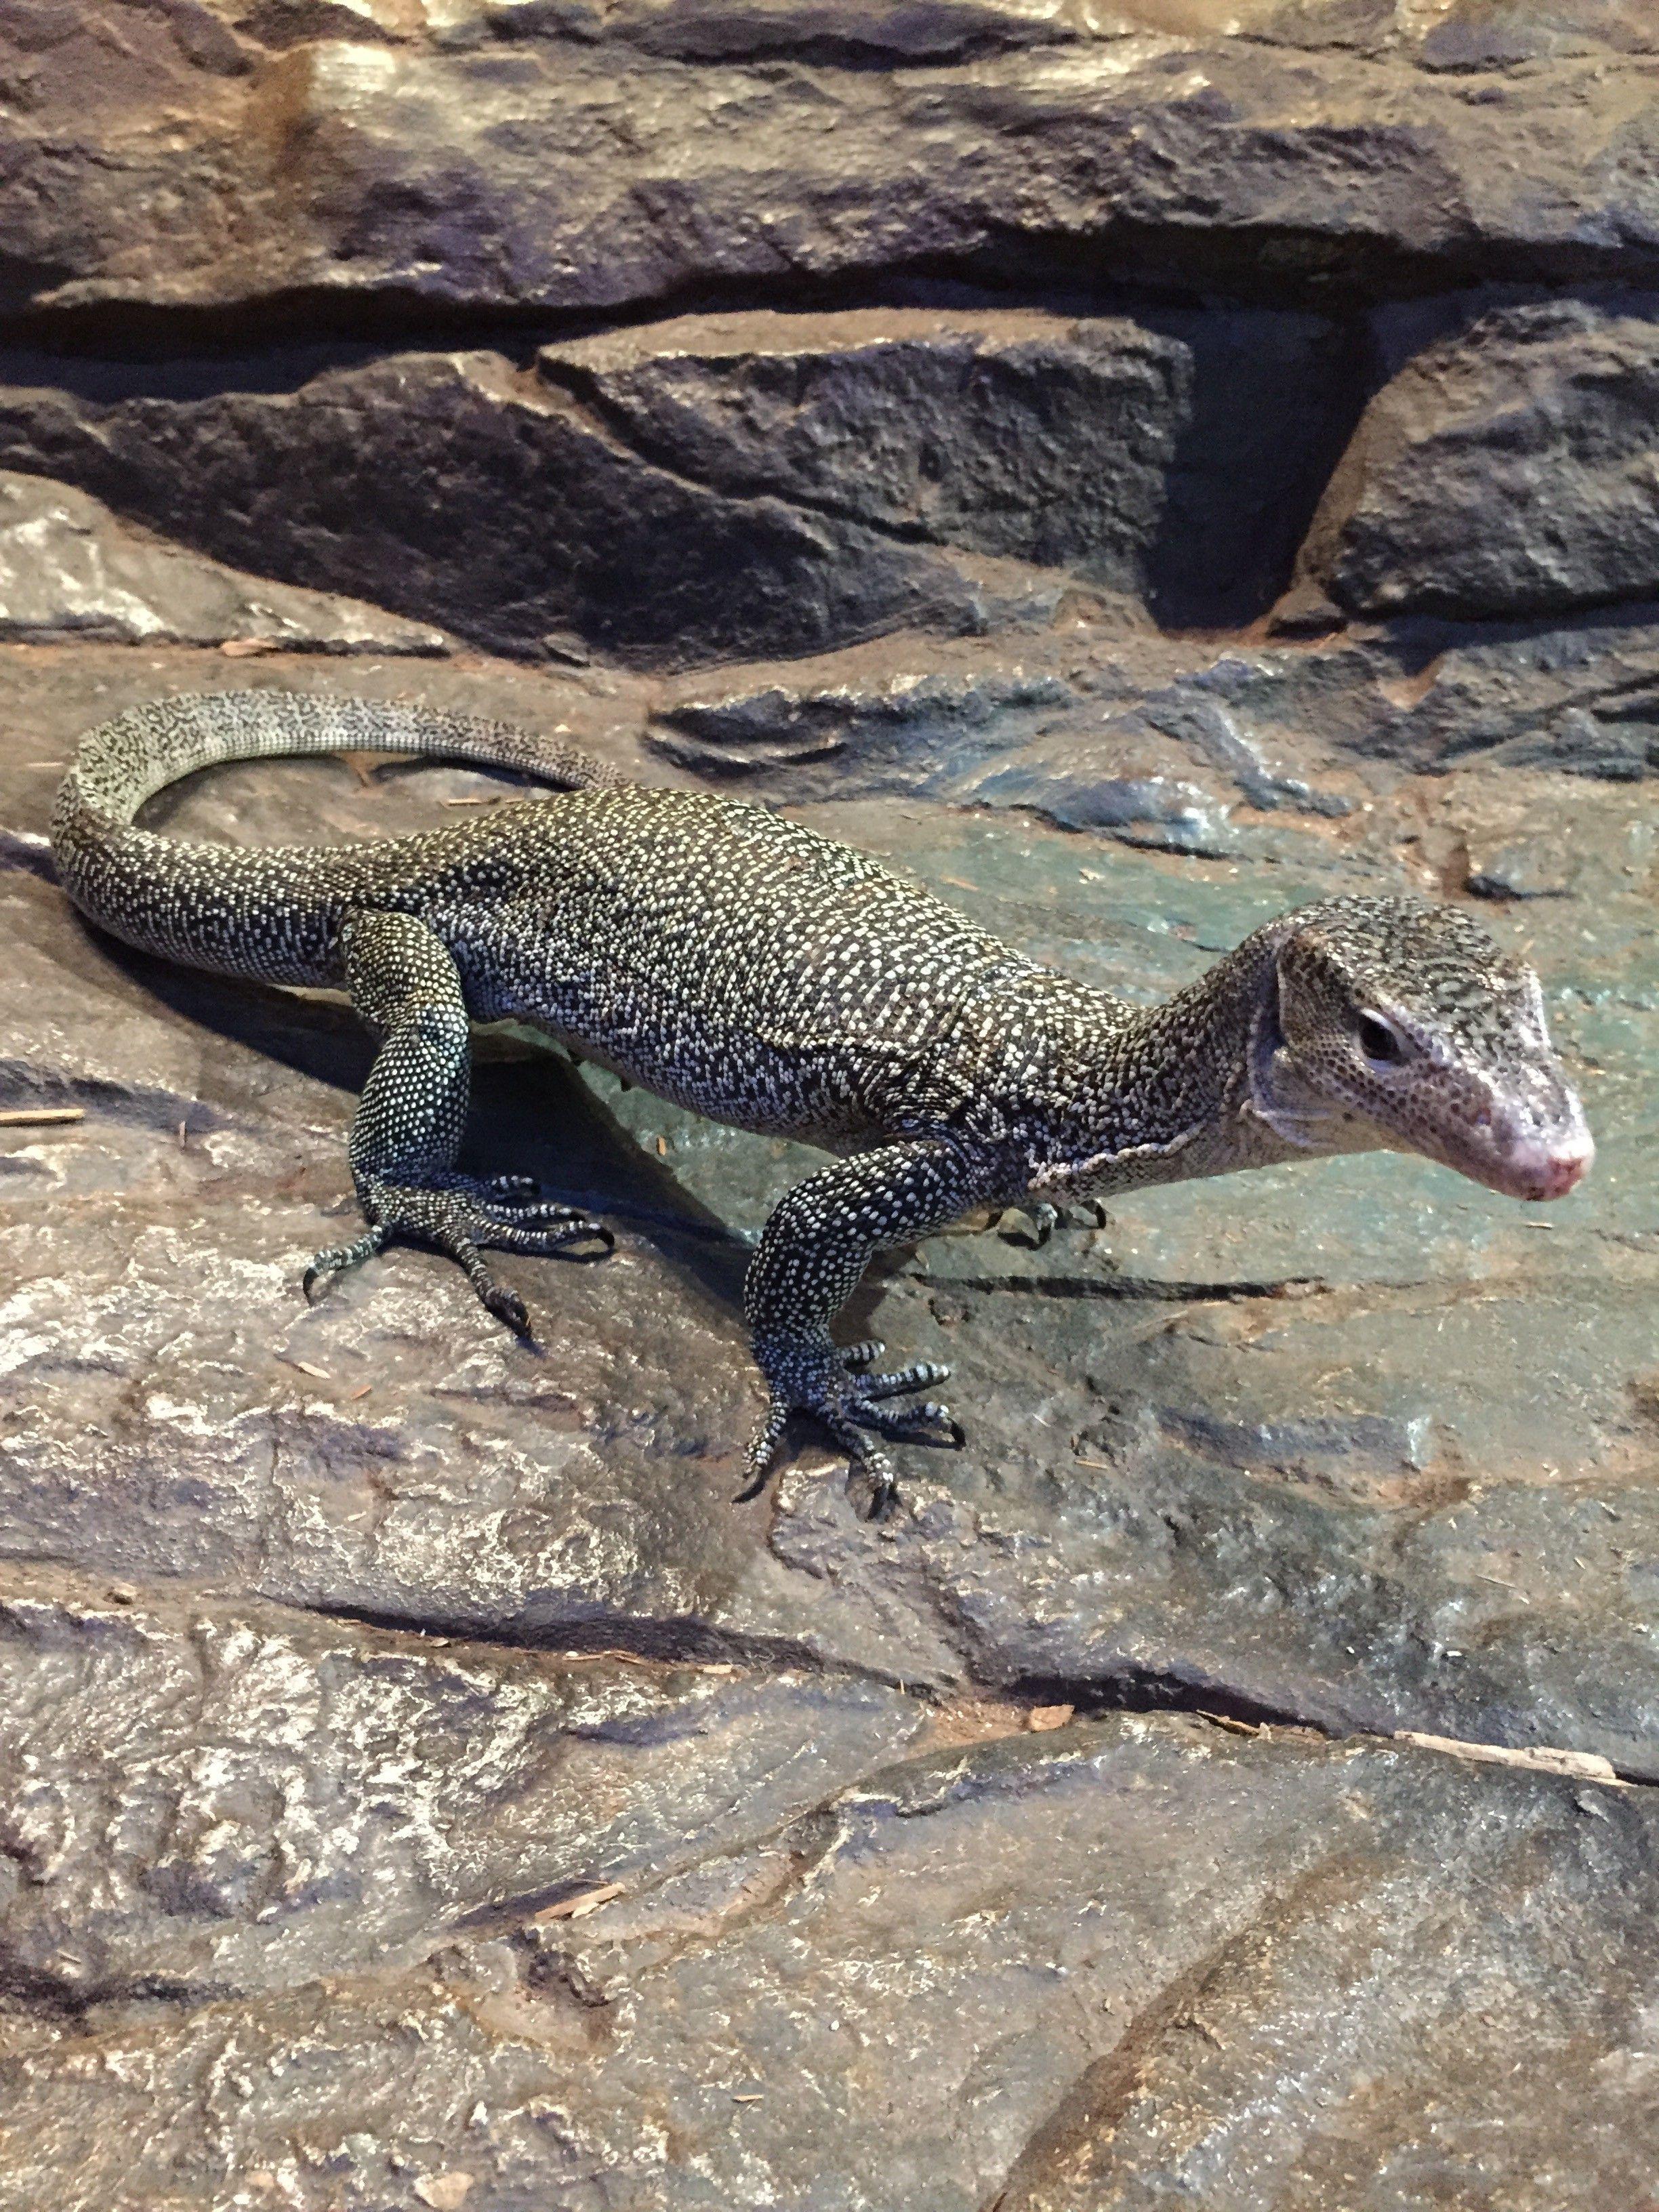 NERD Mangrove Monitor Reptiles pet